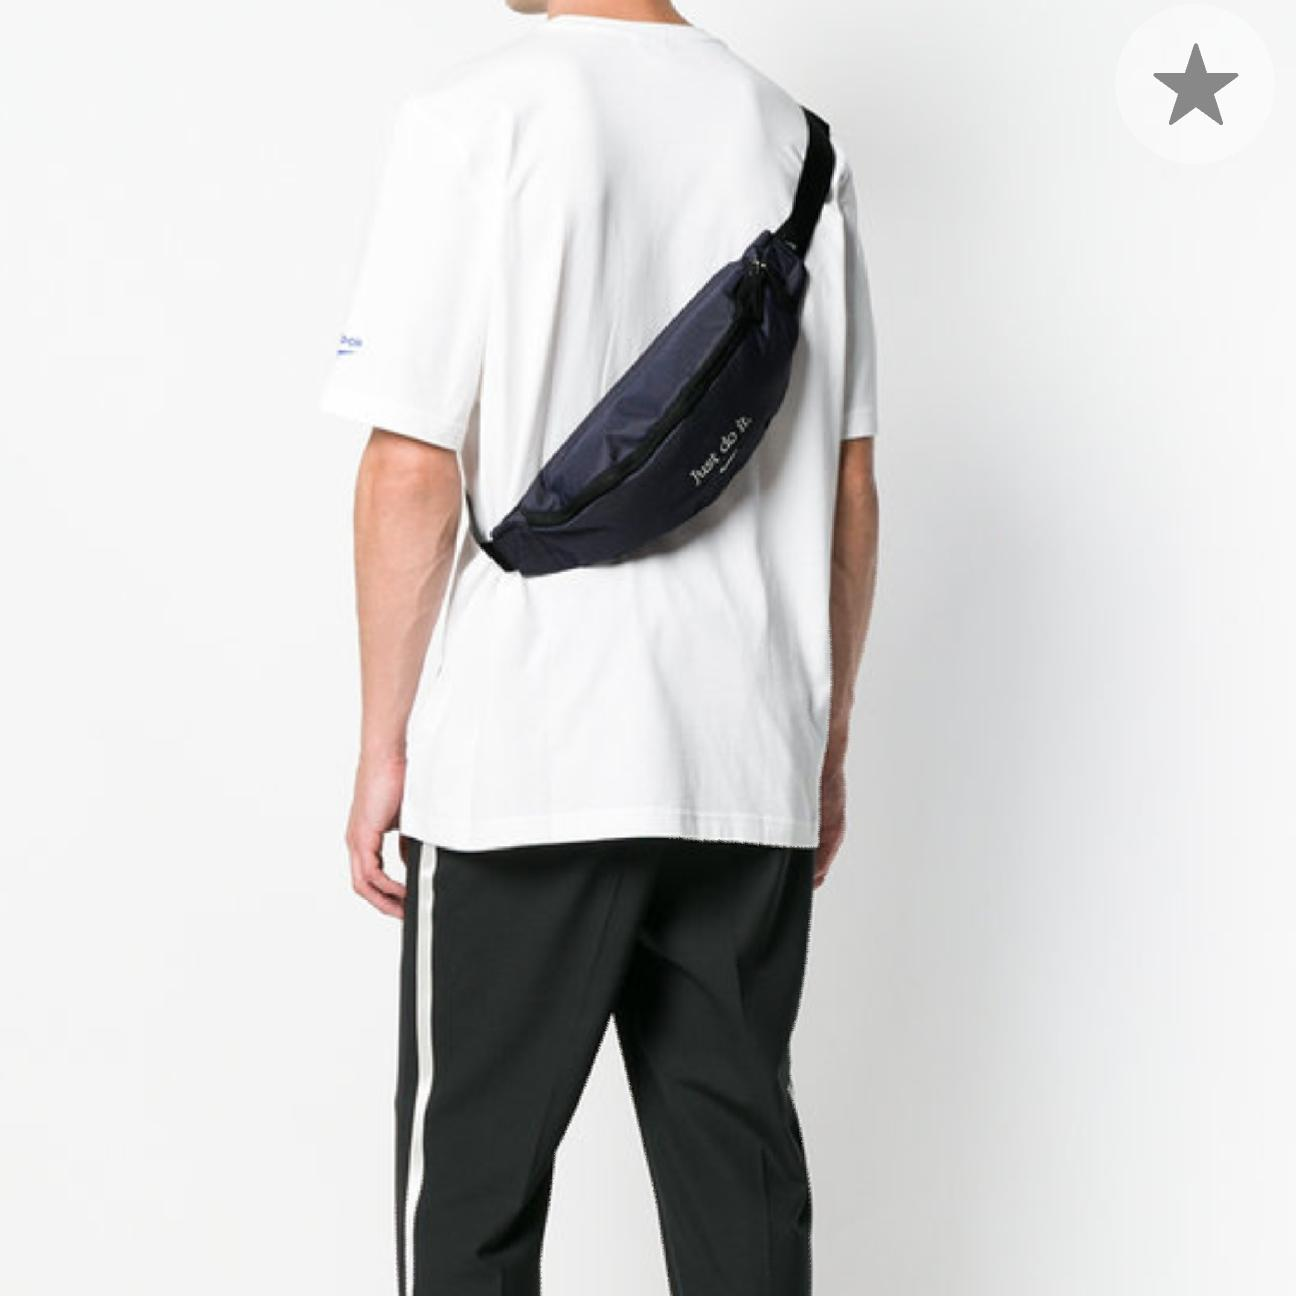 Kelebihan Original Bnib Haritage Belt Bag Nike Just Do It Farfecth Backpack Pria Raindoz Bbr611 Classic Black White